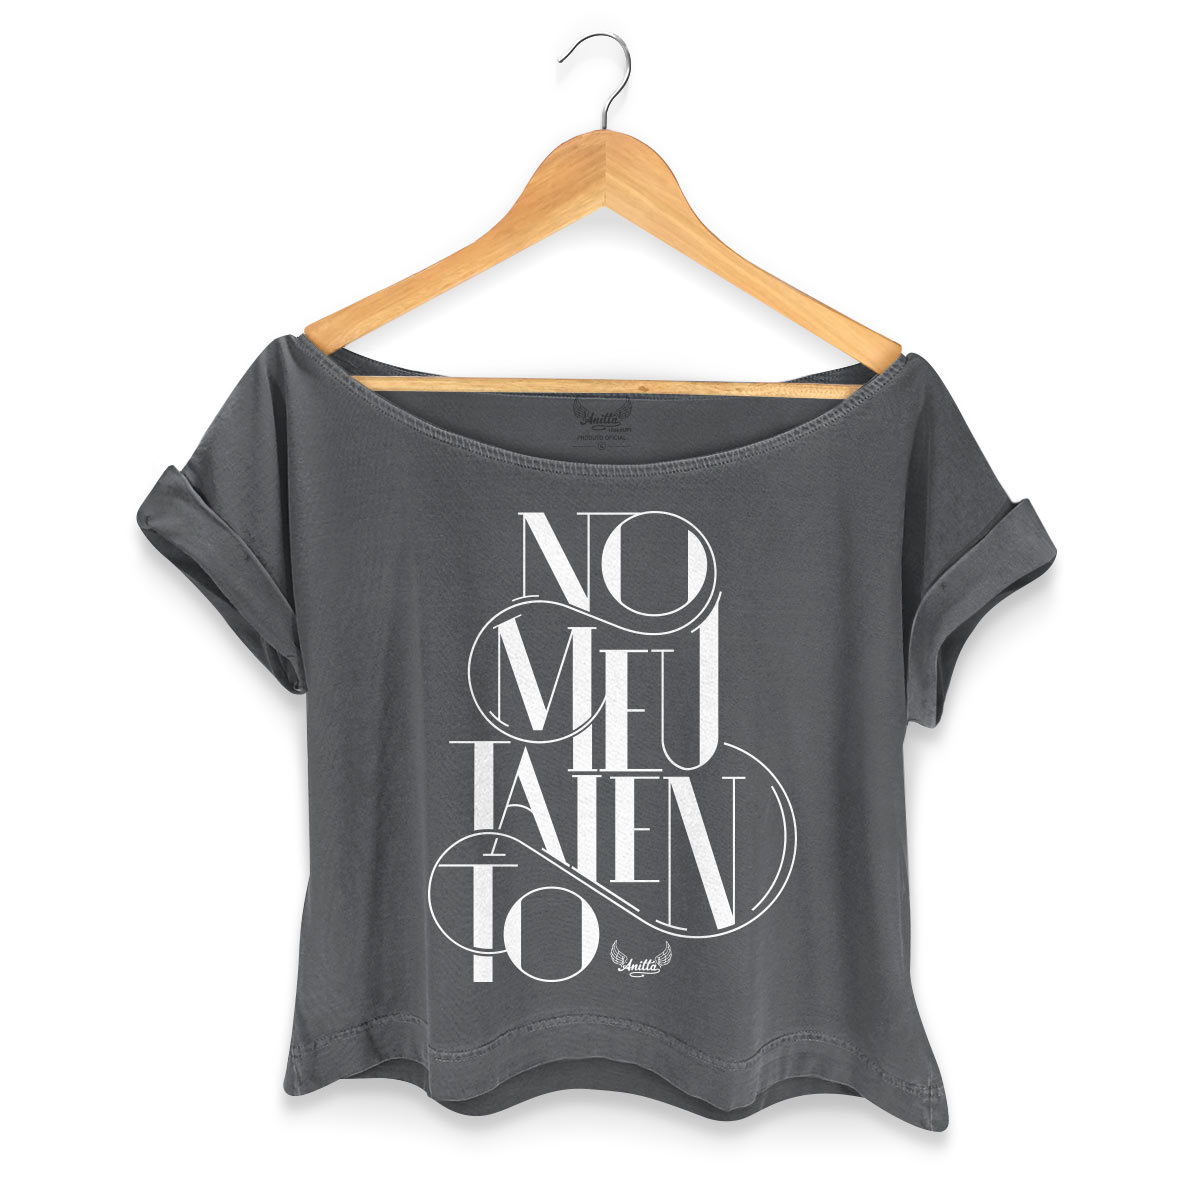 T-shirt Premium Feminina Gola Canoa Anitta Te Hipnotizar No meu Talento